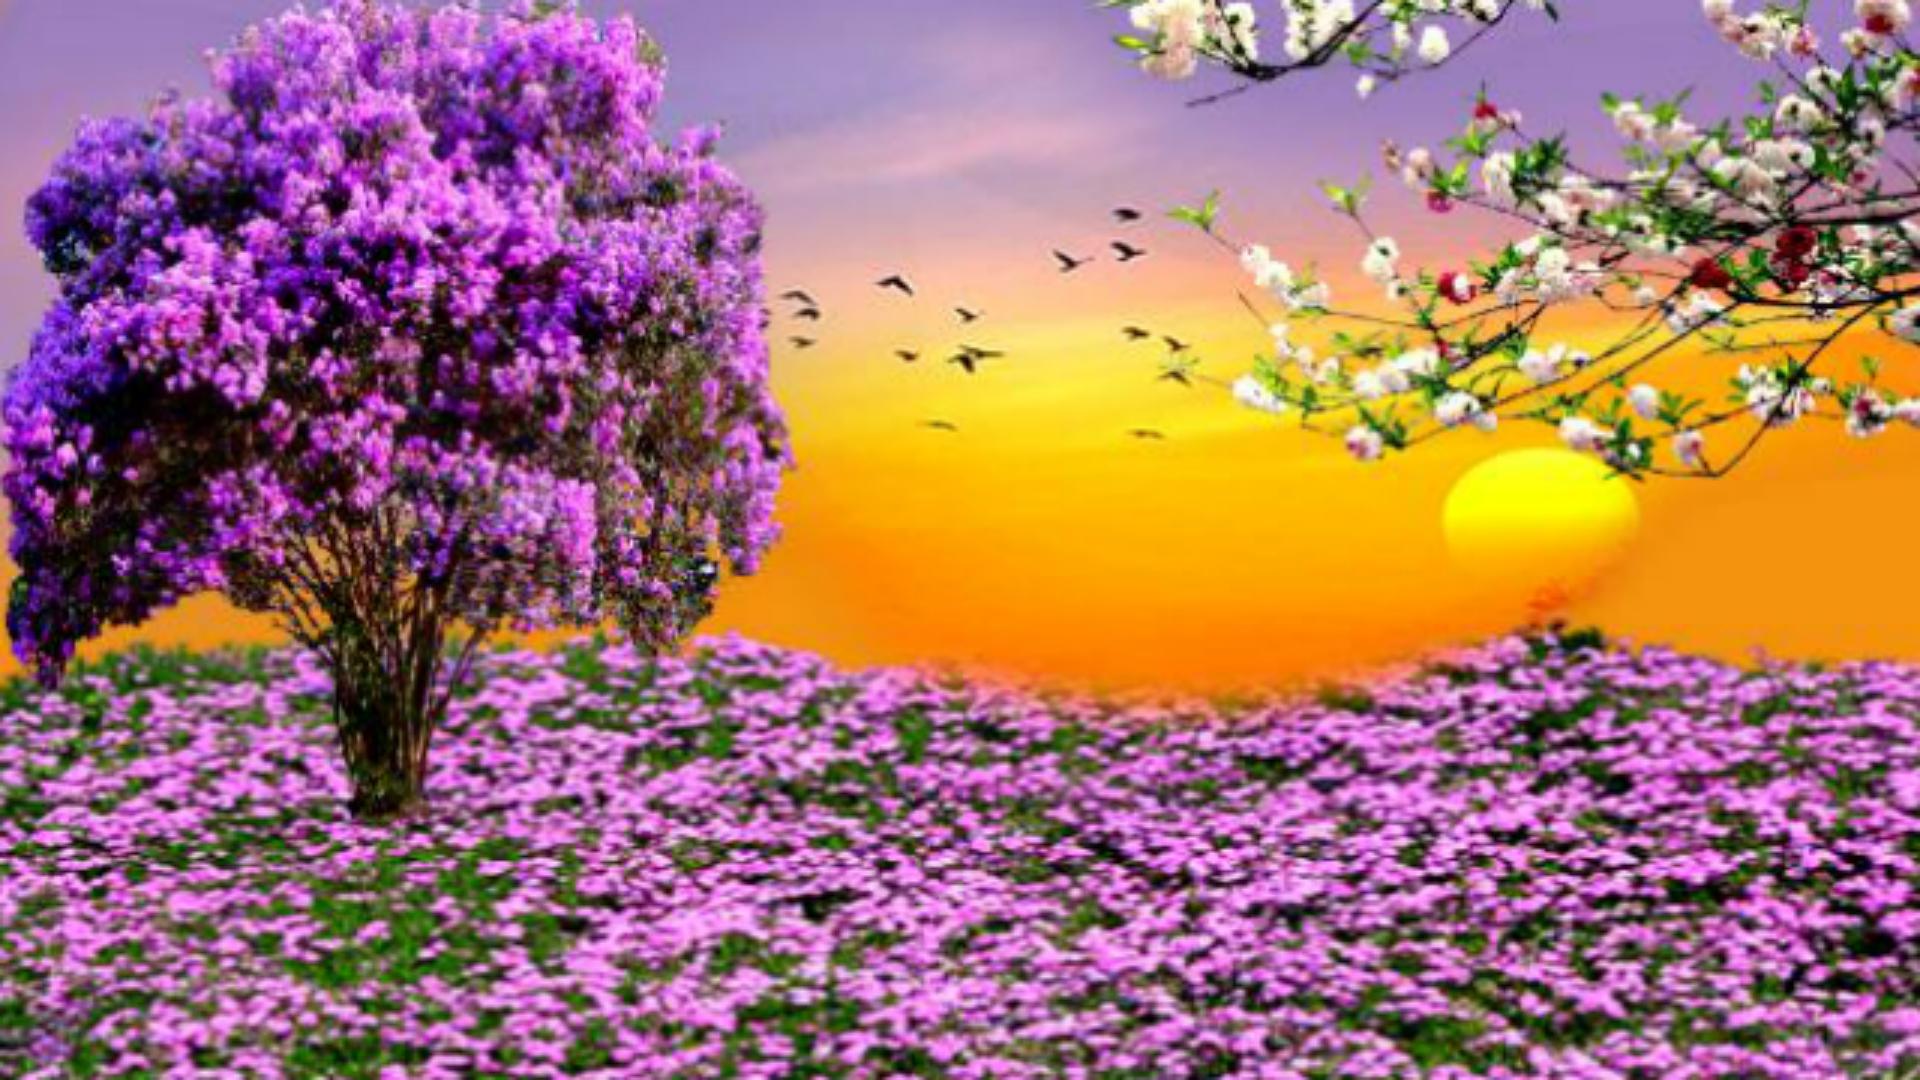 Spring Scenes Desktop Wallpapers   HD Wallpapers Backgrounds of Your 1920x1080